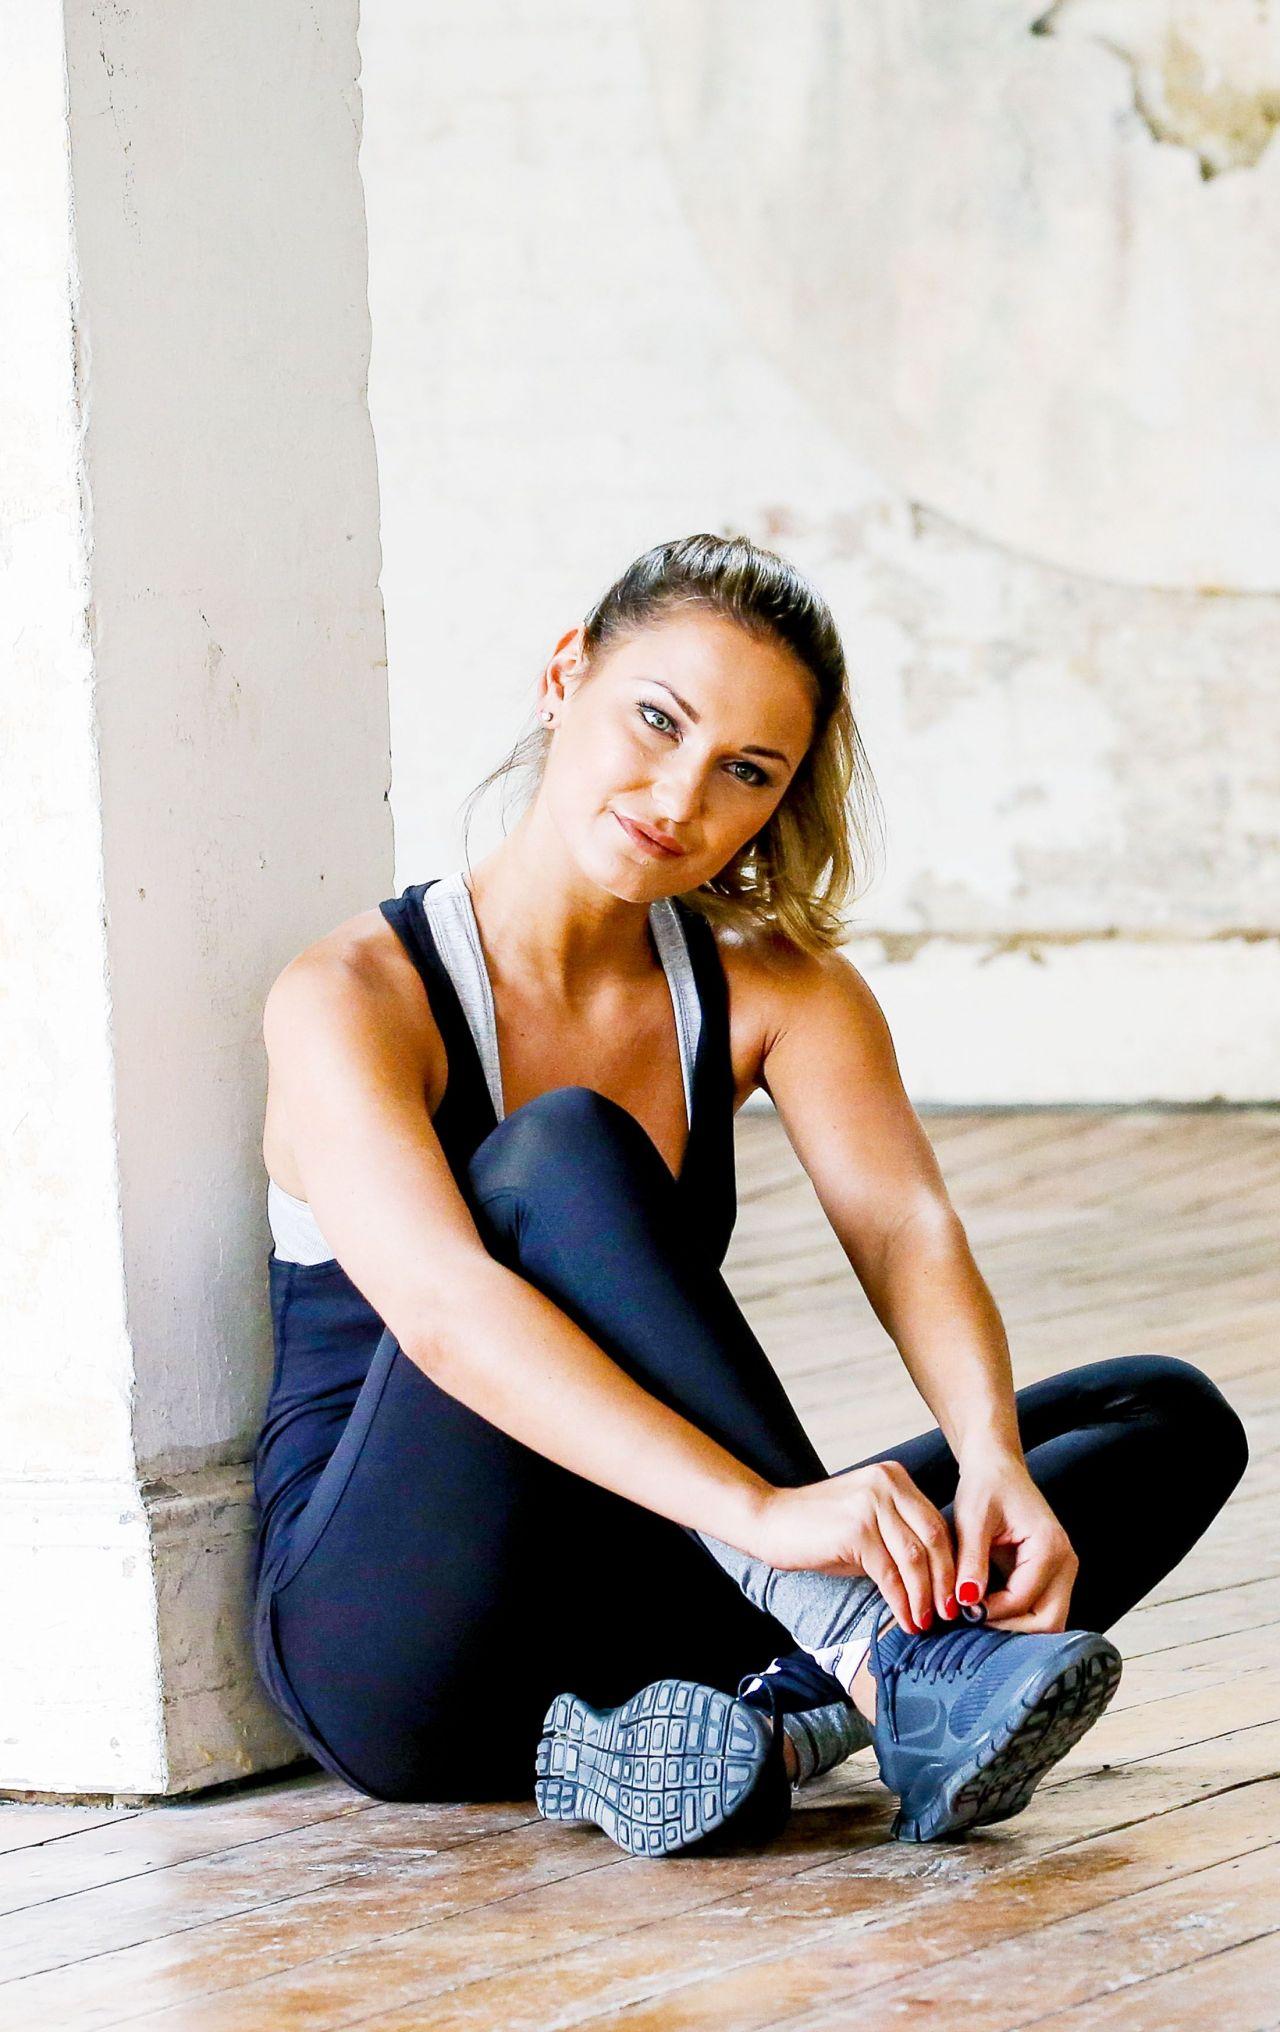 Sam Faiers Workout Photoshoot 2014